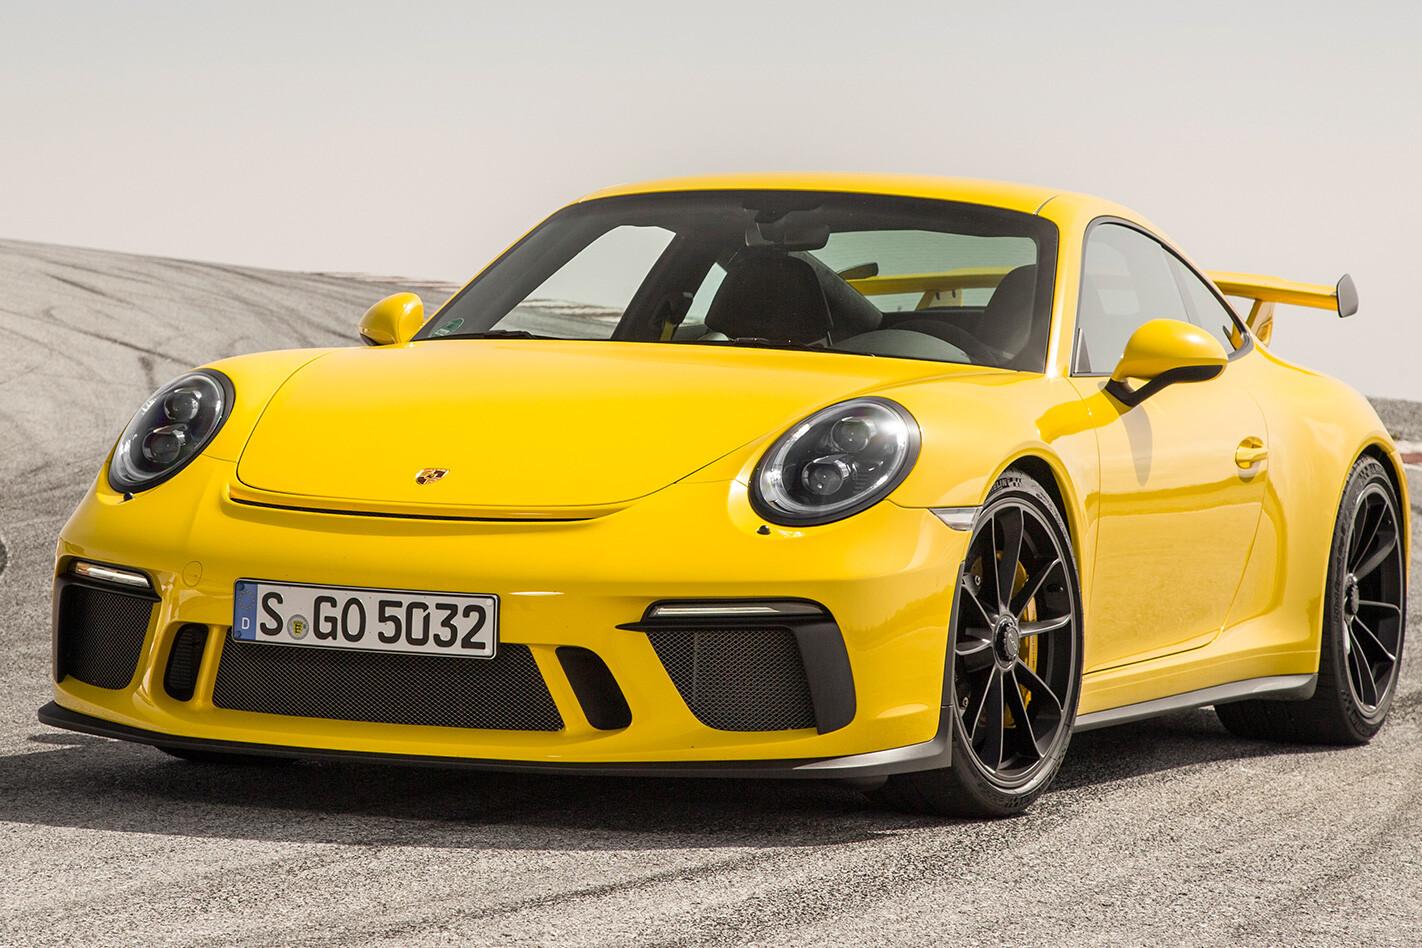 2017 Porsche 911 GT3 manual front